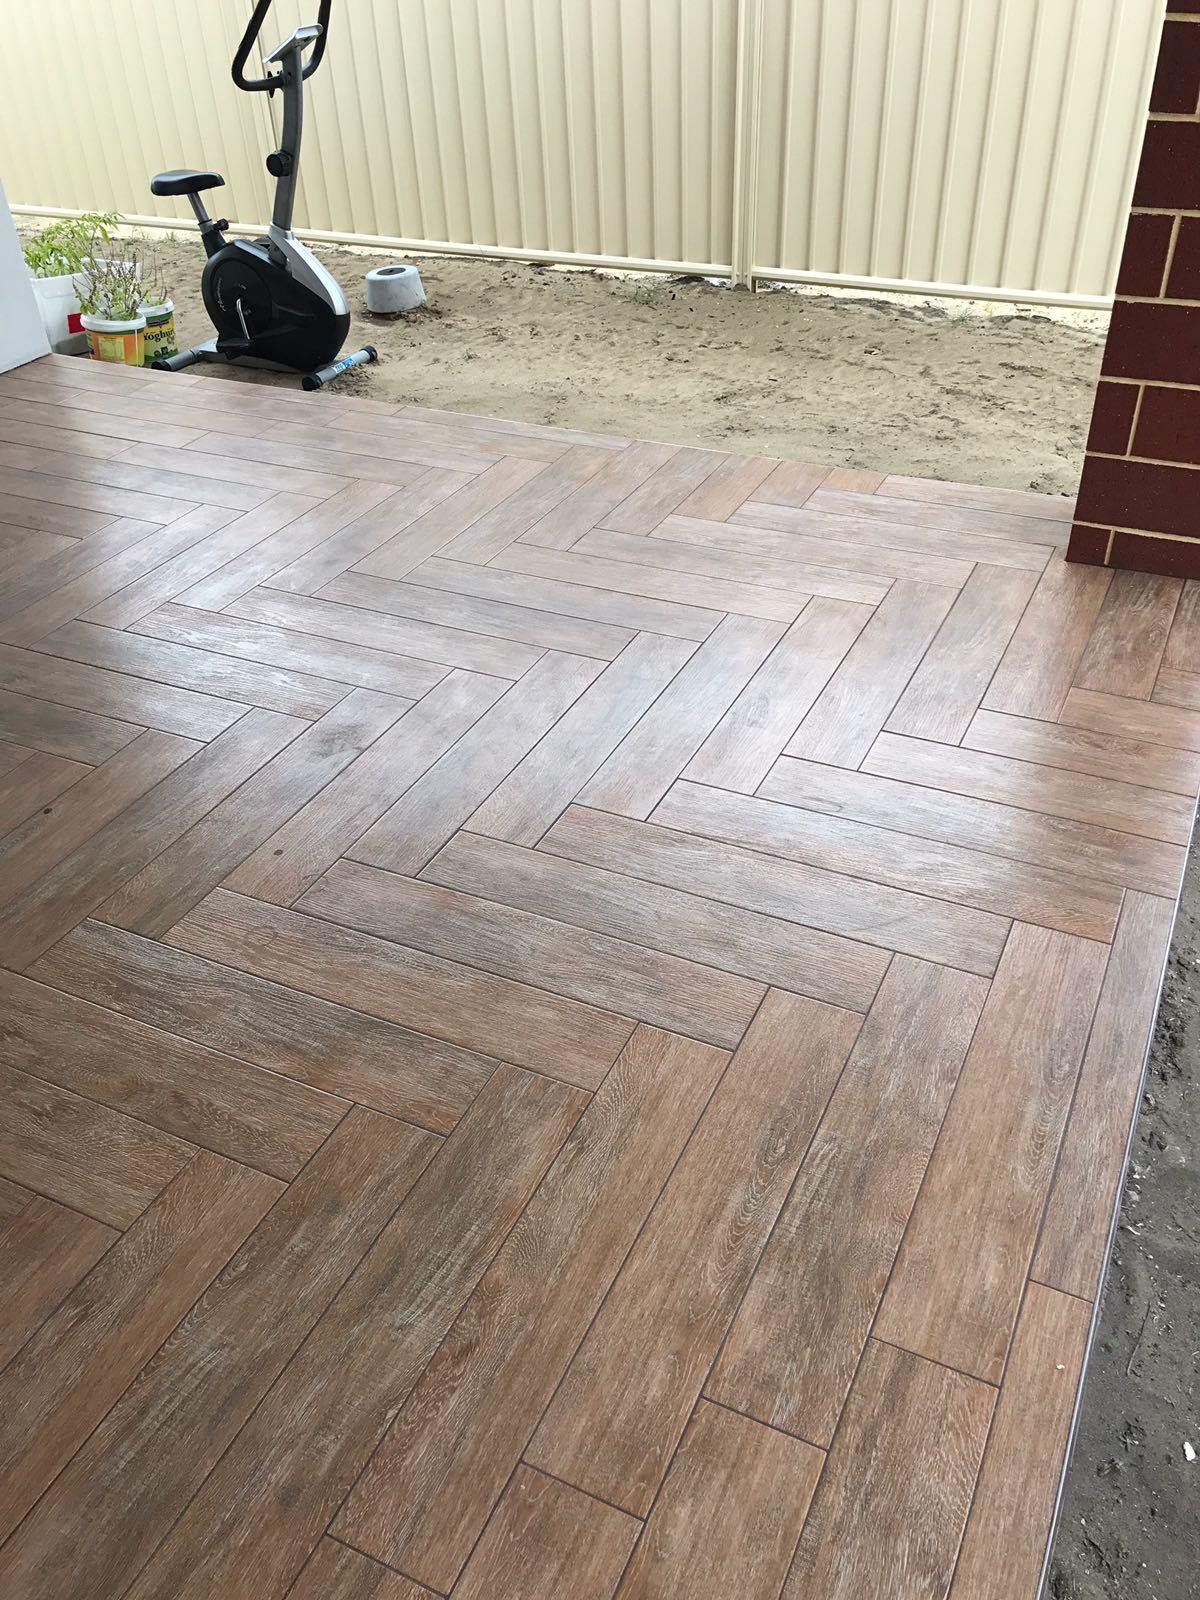 6x32 Wood Look Porcelain Floor Tile